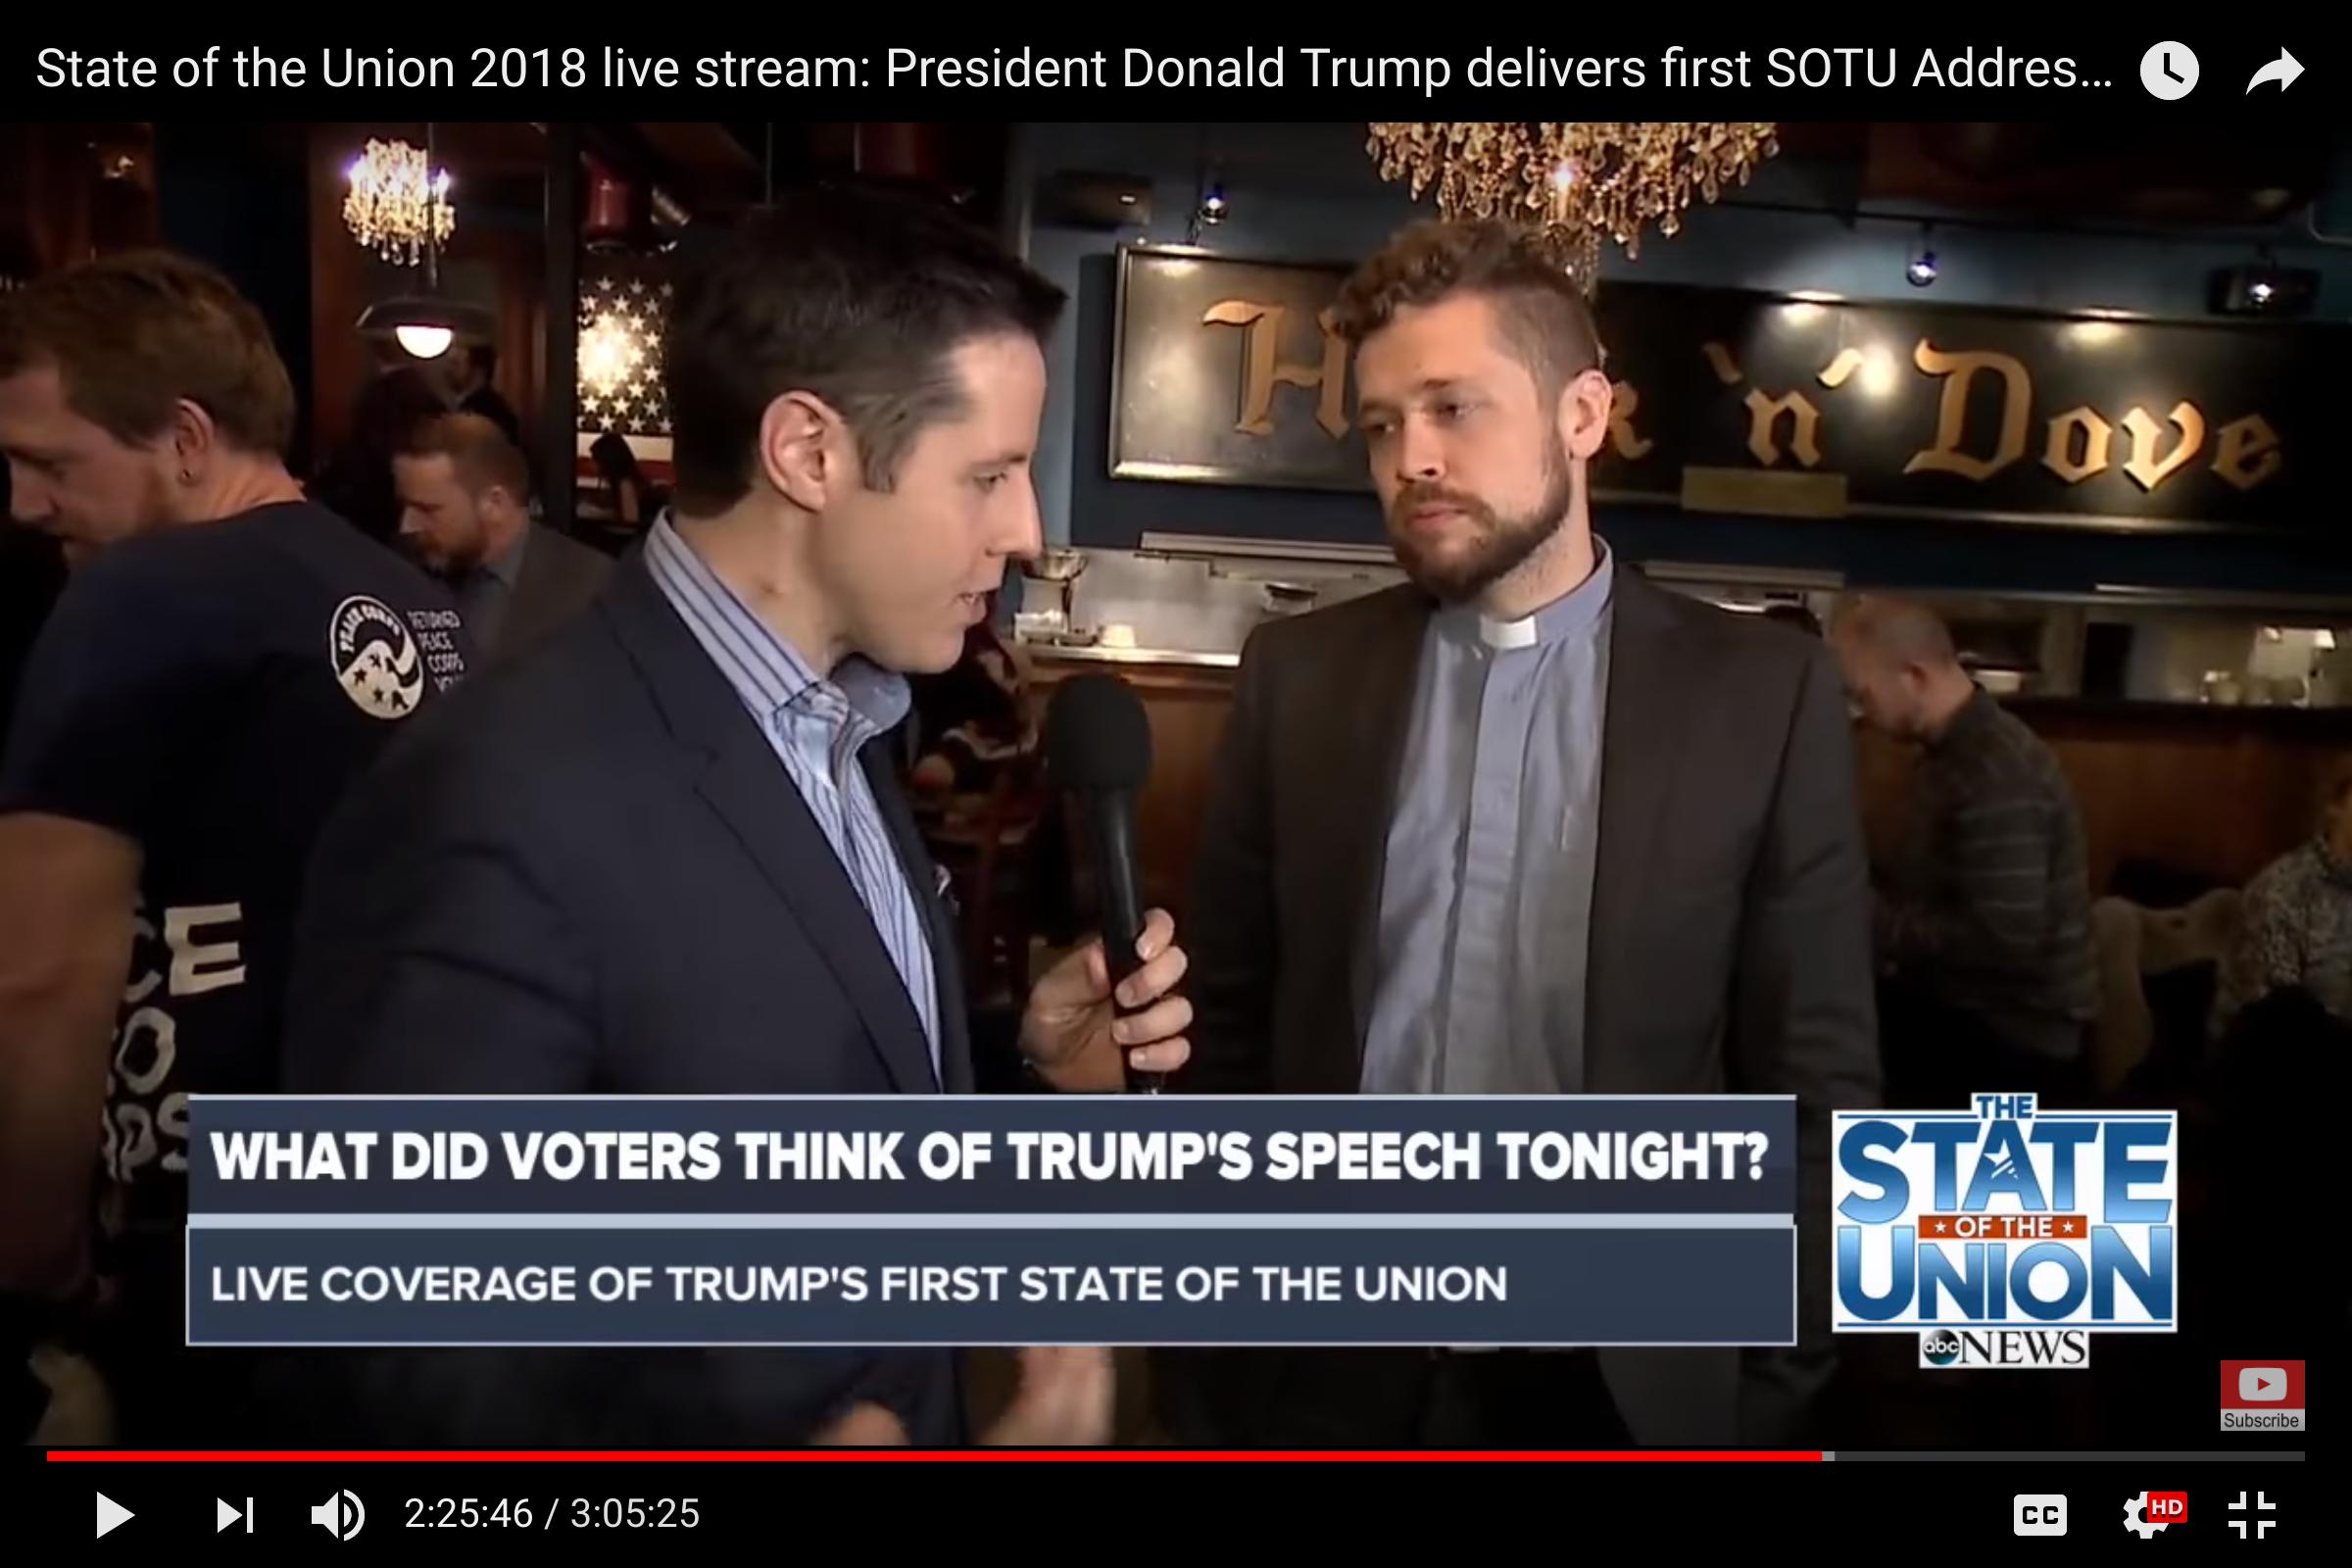 Screenshot 2018-02-19 at 3.07.54 PM.png